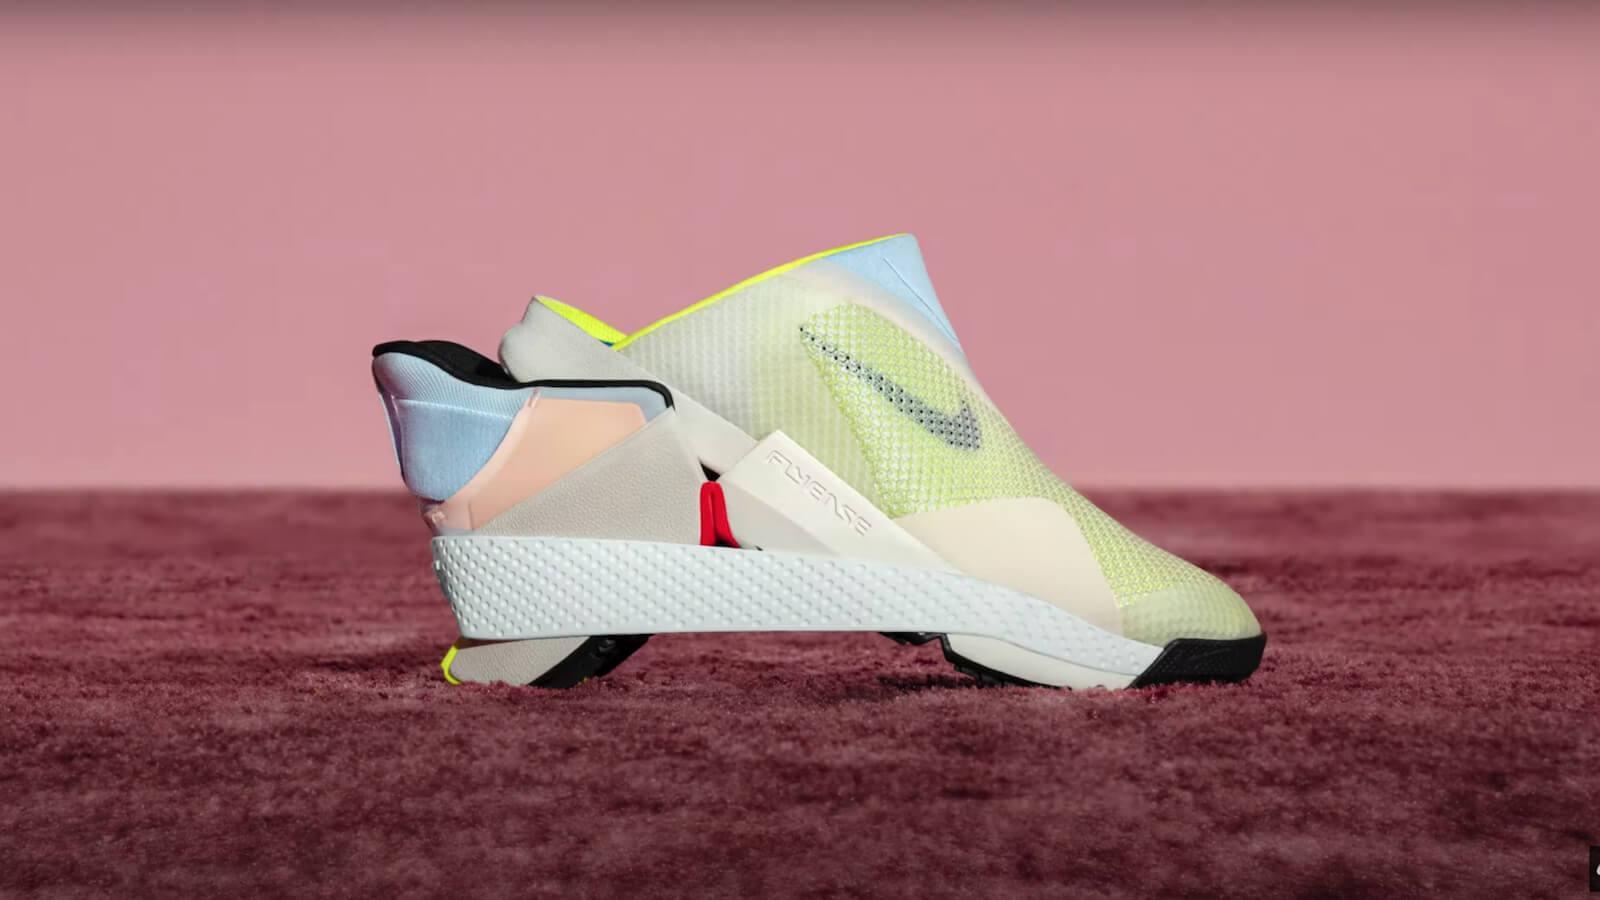 Nike Go FlyEase hands-free shoe has a clog-like shape for hands-free access